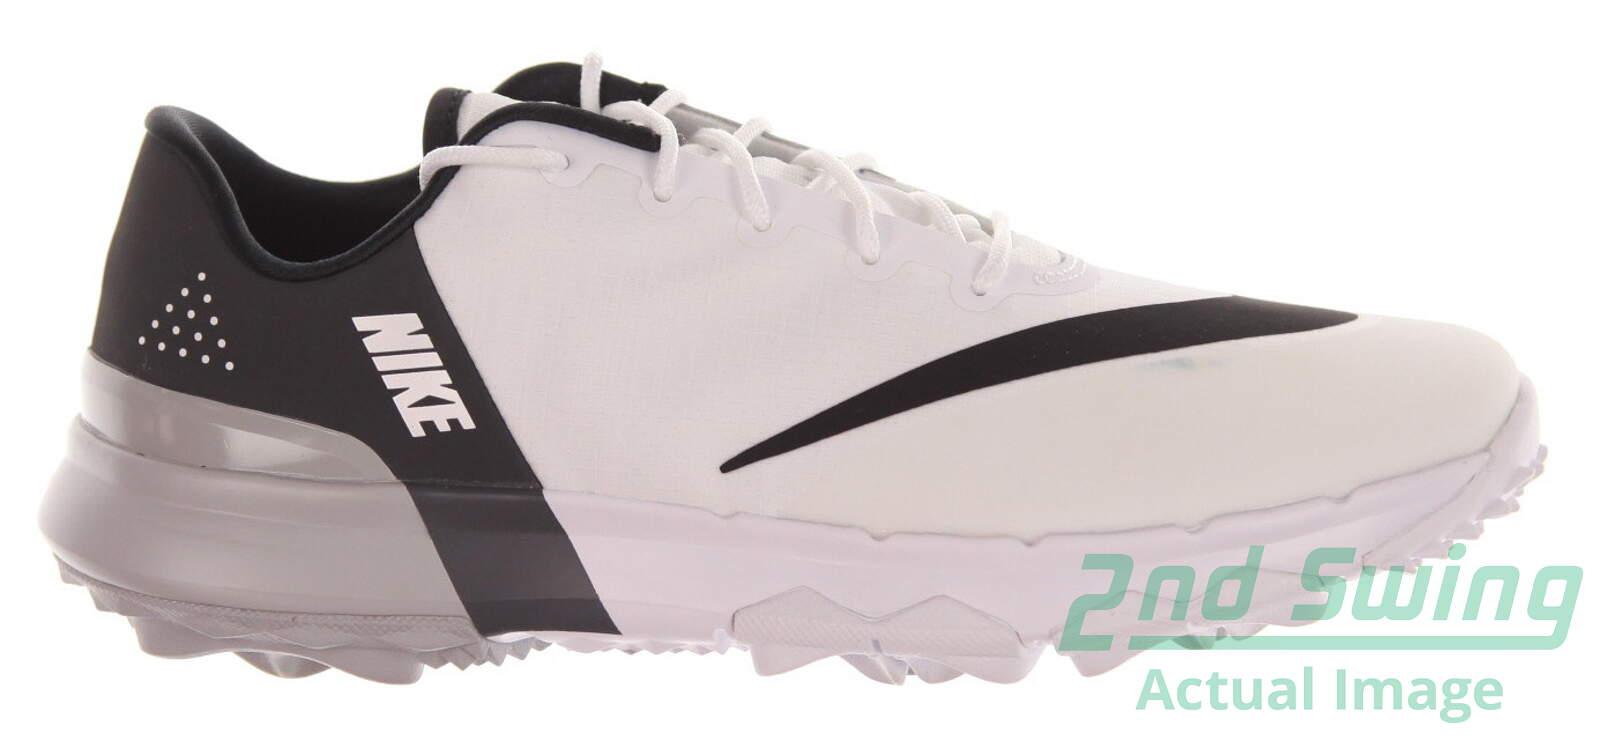 b9155dff9499 New Womens Golf Shoe Nike FI Flex 7.5 White Black MSRP  100 - Golf Footwear